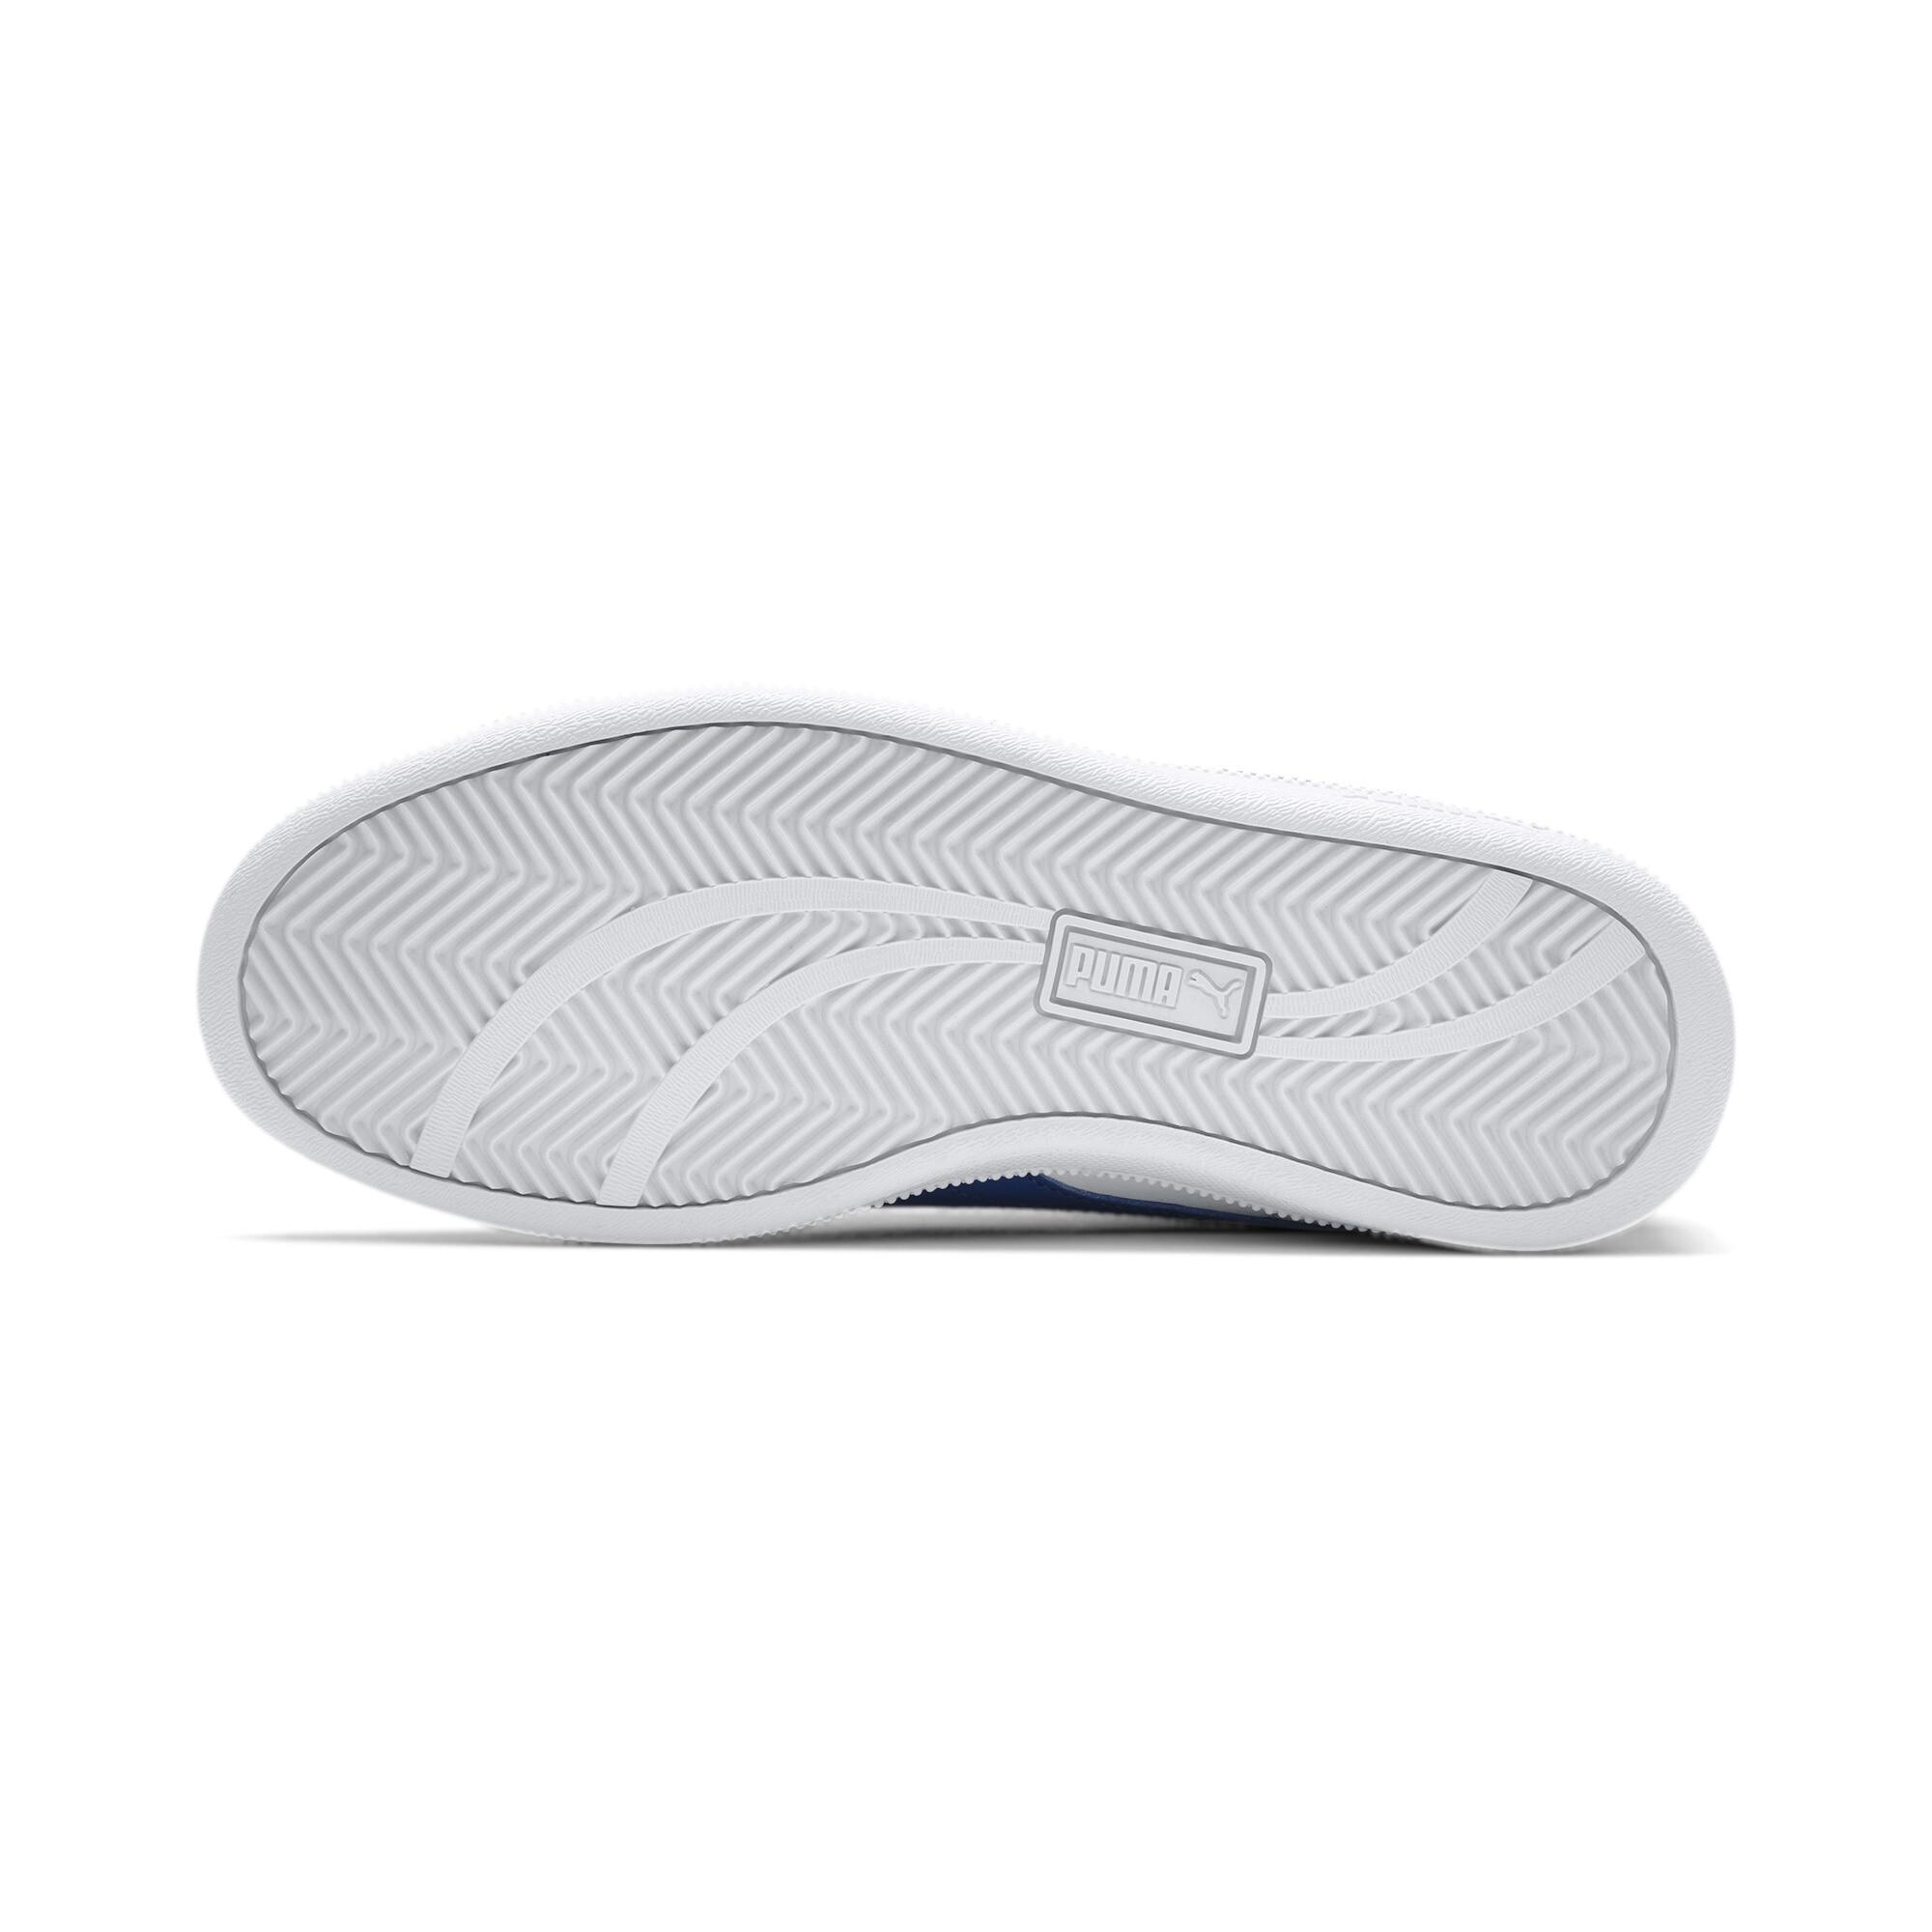 PUMA-Smash-Jr-Sneaker-Unisex-Schuhe-Kinder-Neu Indexbild 15